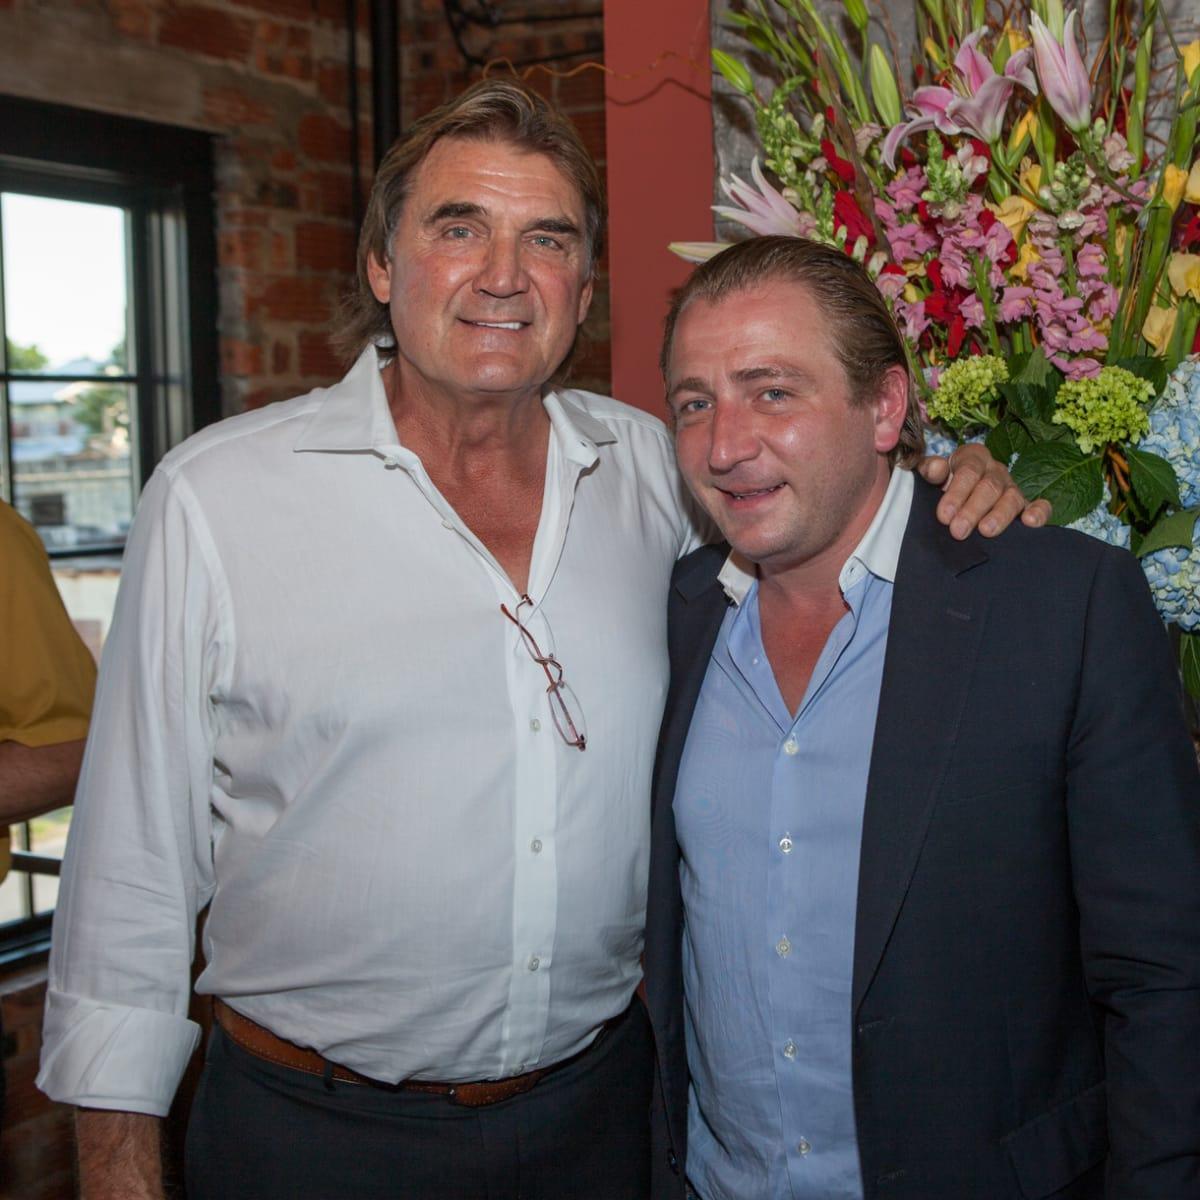 Houston, Pastorini party, June 2015, Dan Pastorini, Ben Berg